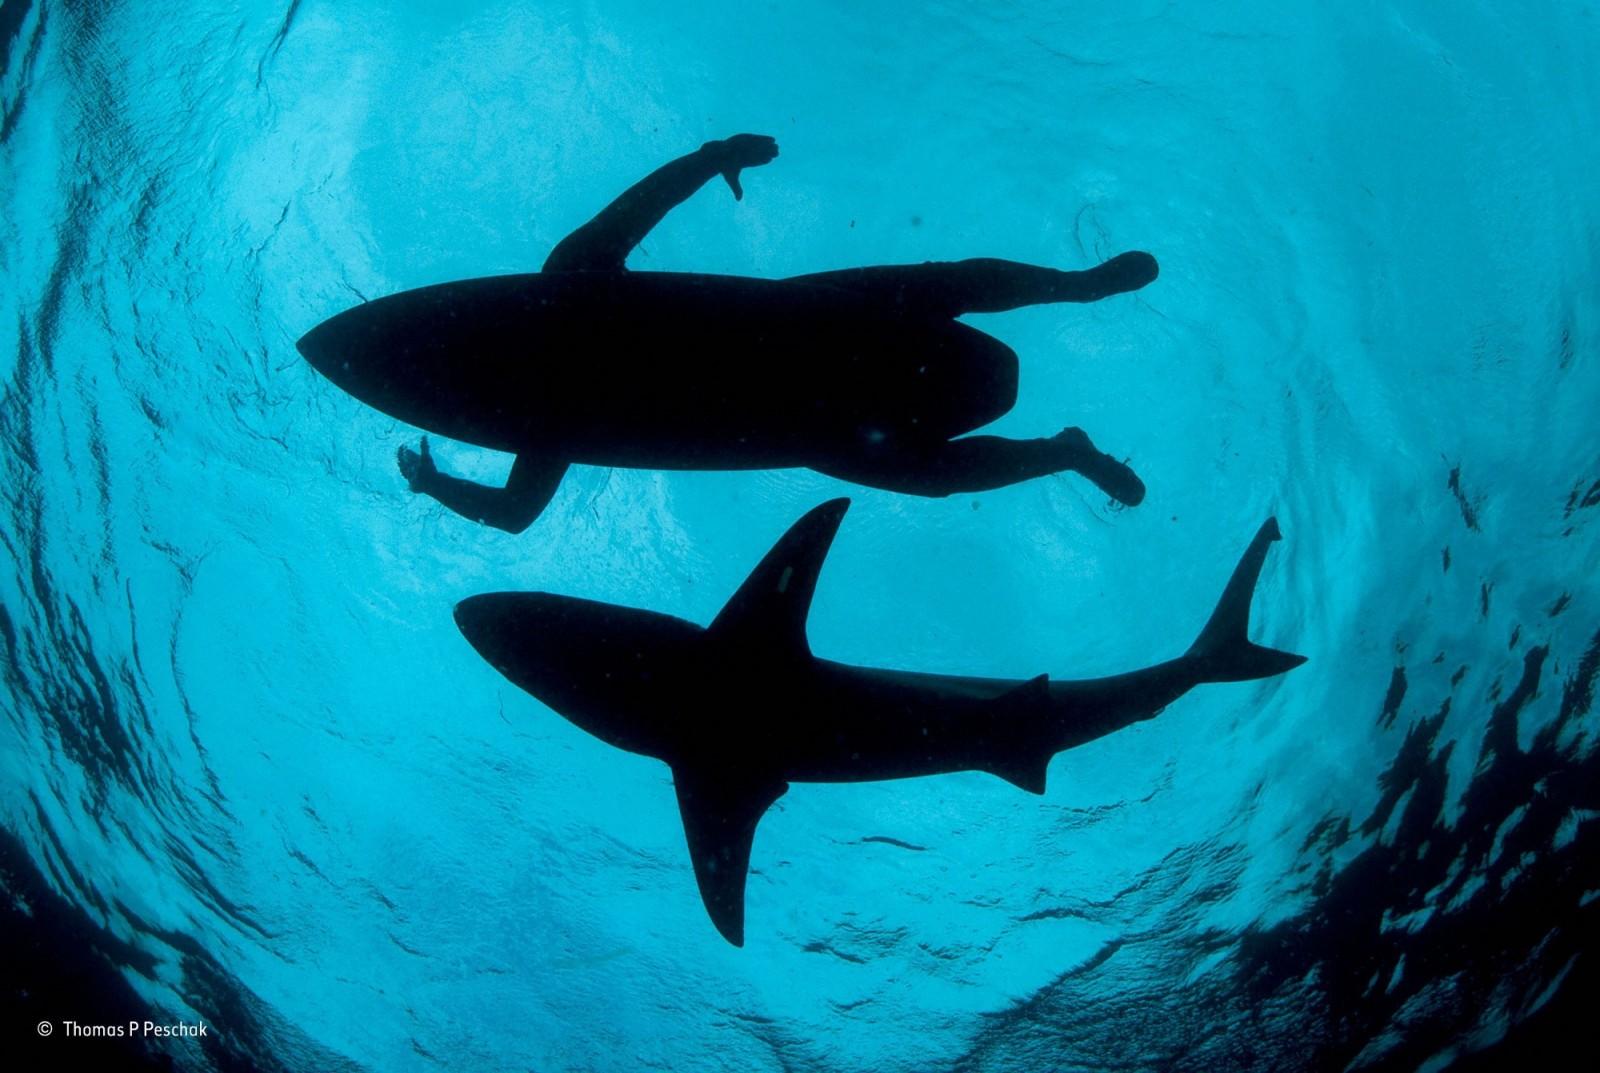 nature_water_underwater_sea_animals_winner_photography_contests-85600.jpg!d.jpg